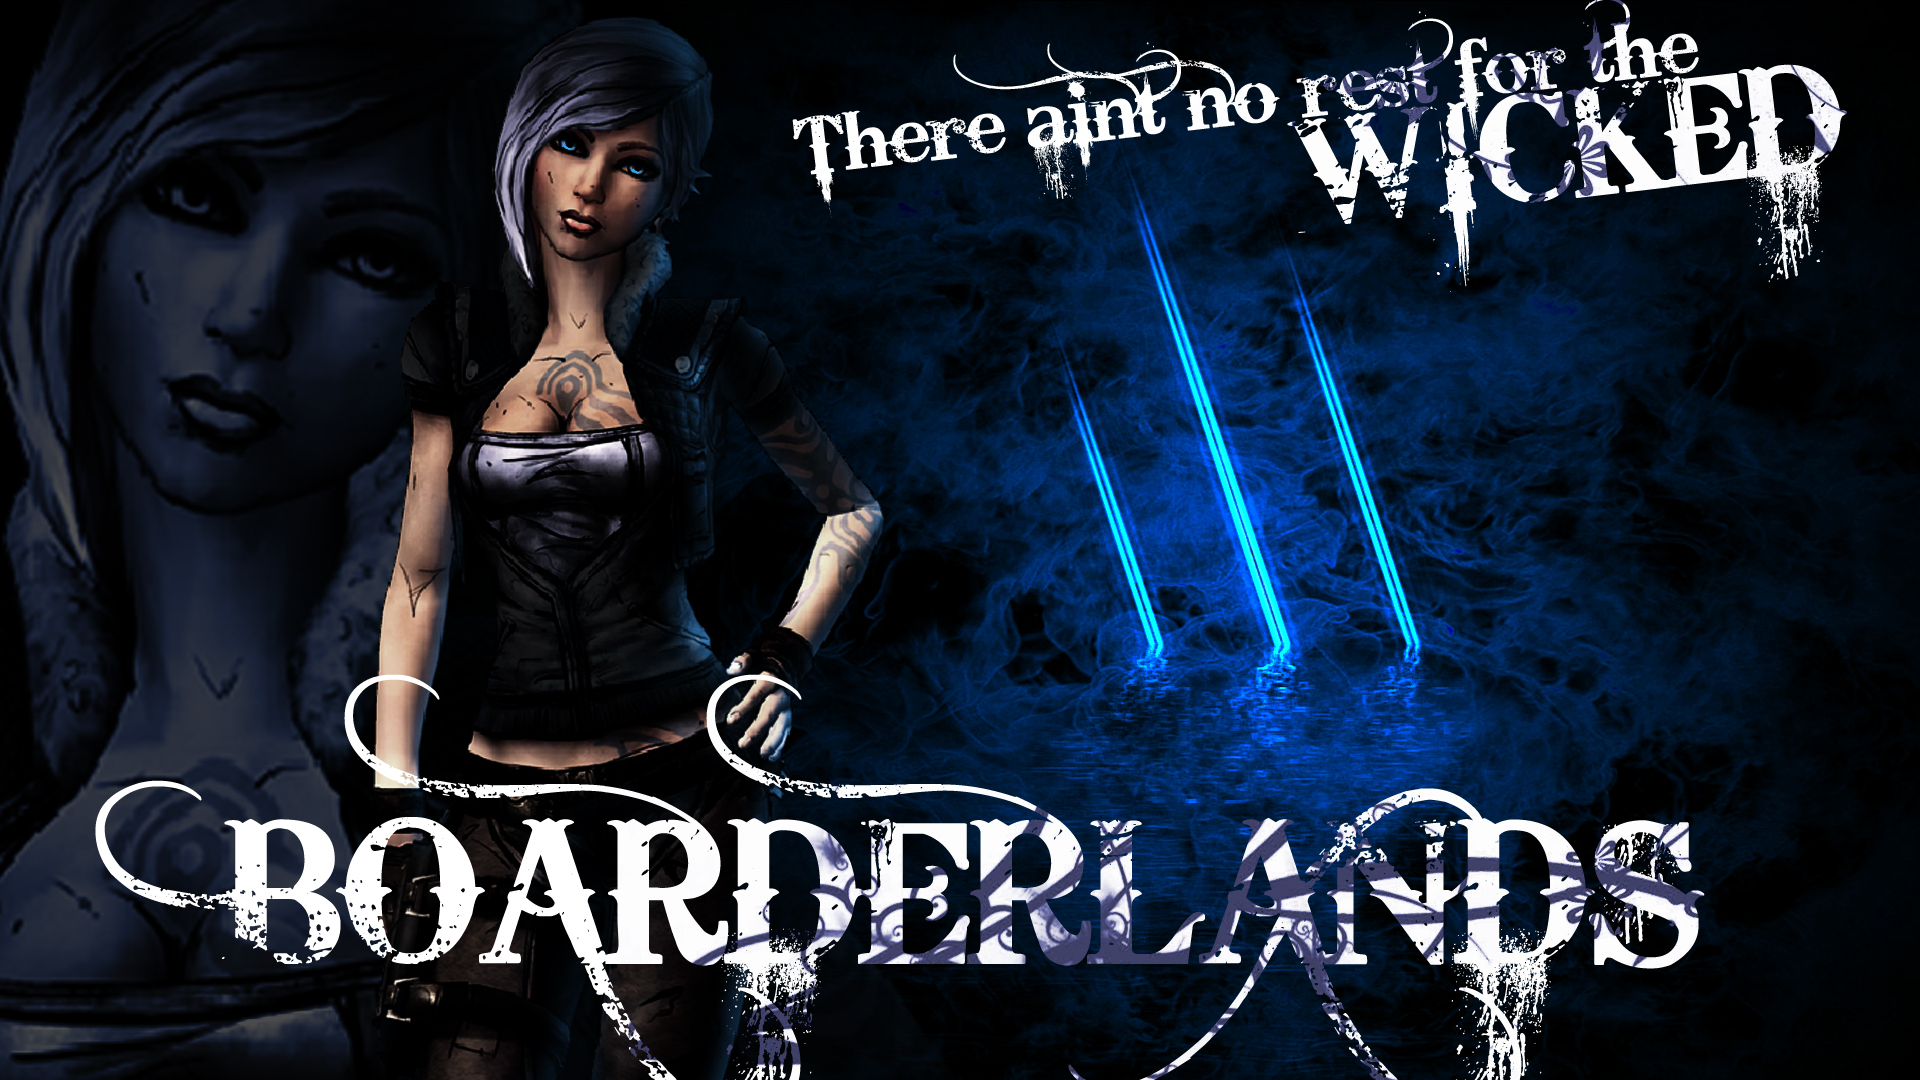 Free Download Borderlands Lilith Images Thefemalecelebrity